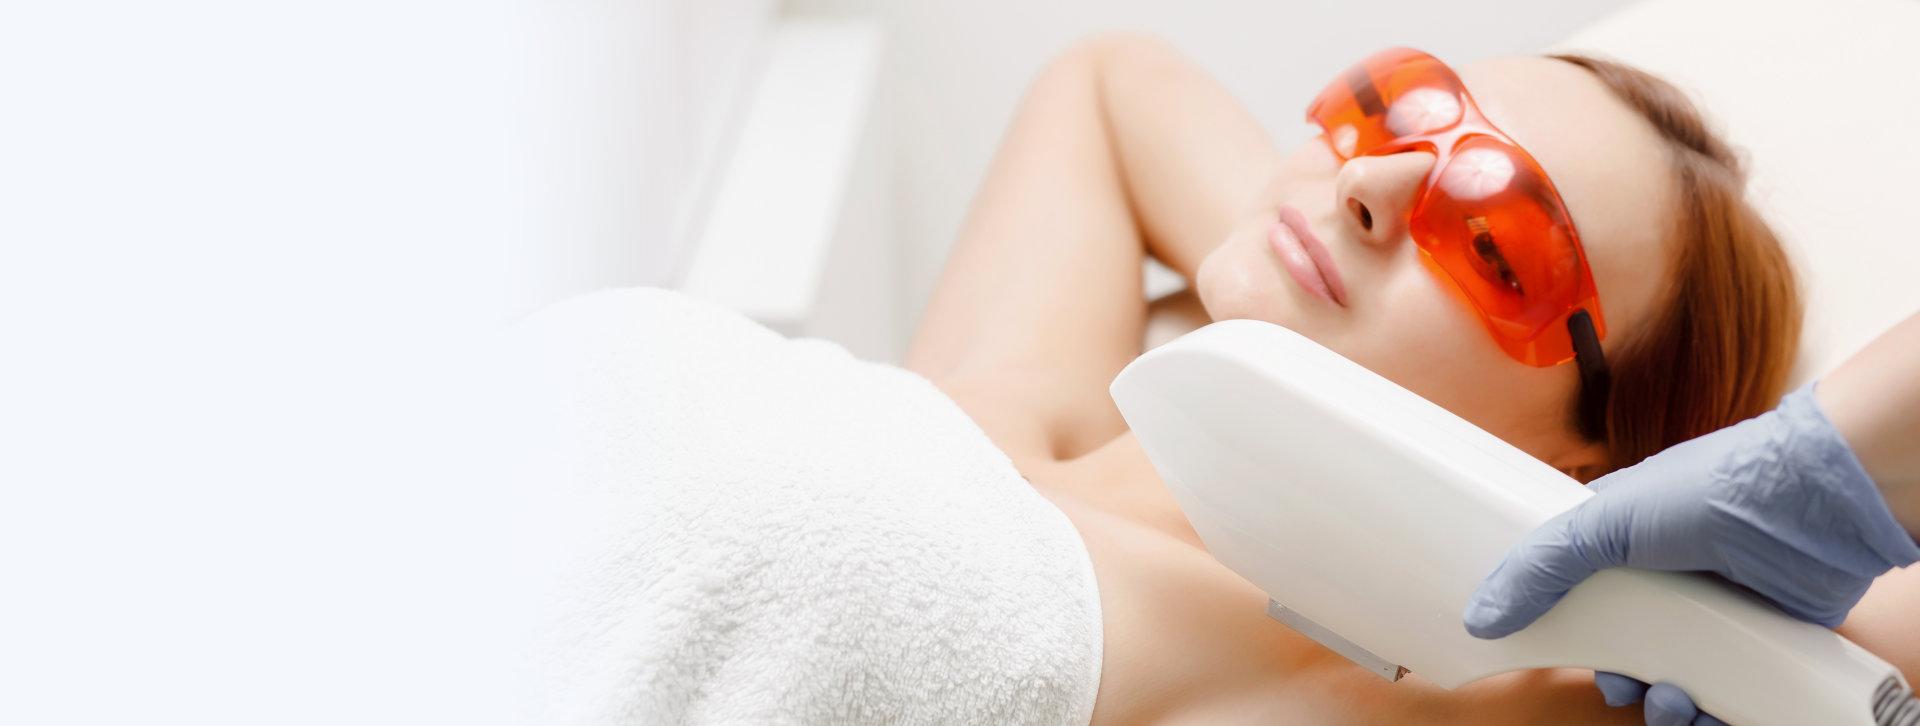 woman undergoing a beauty treatment